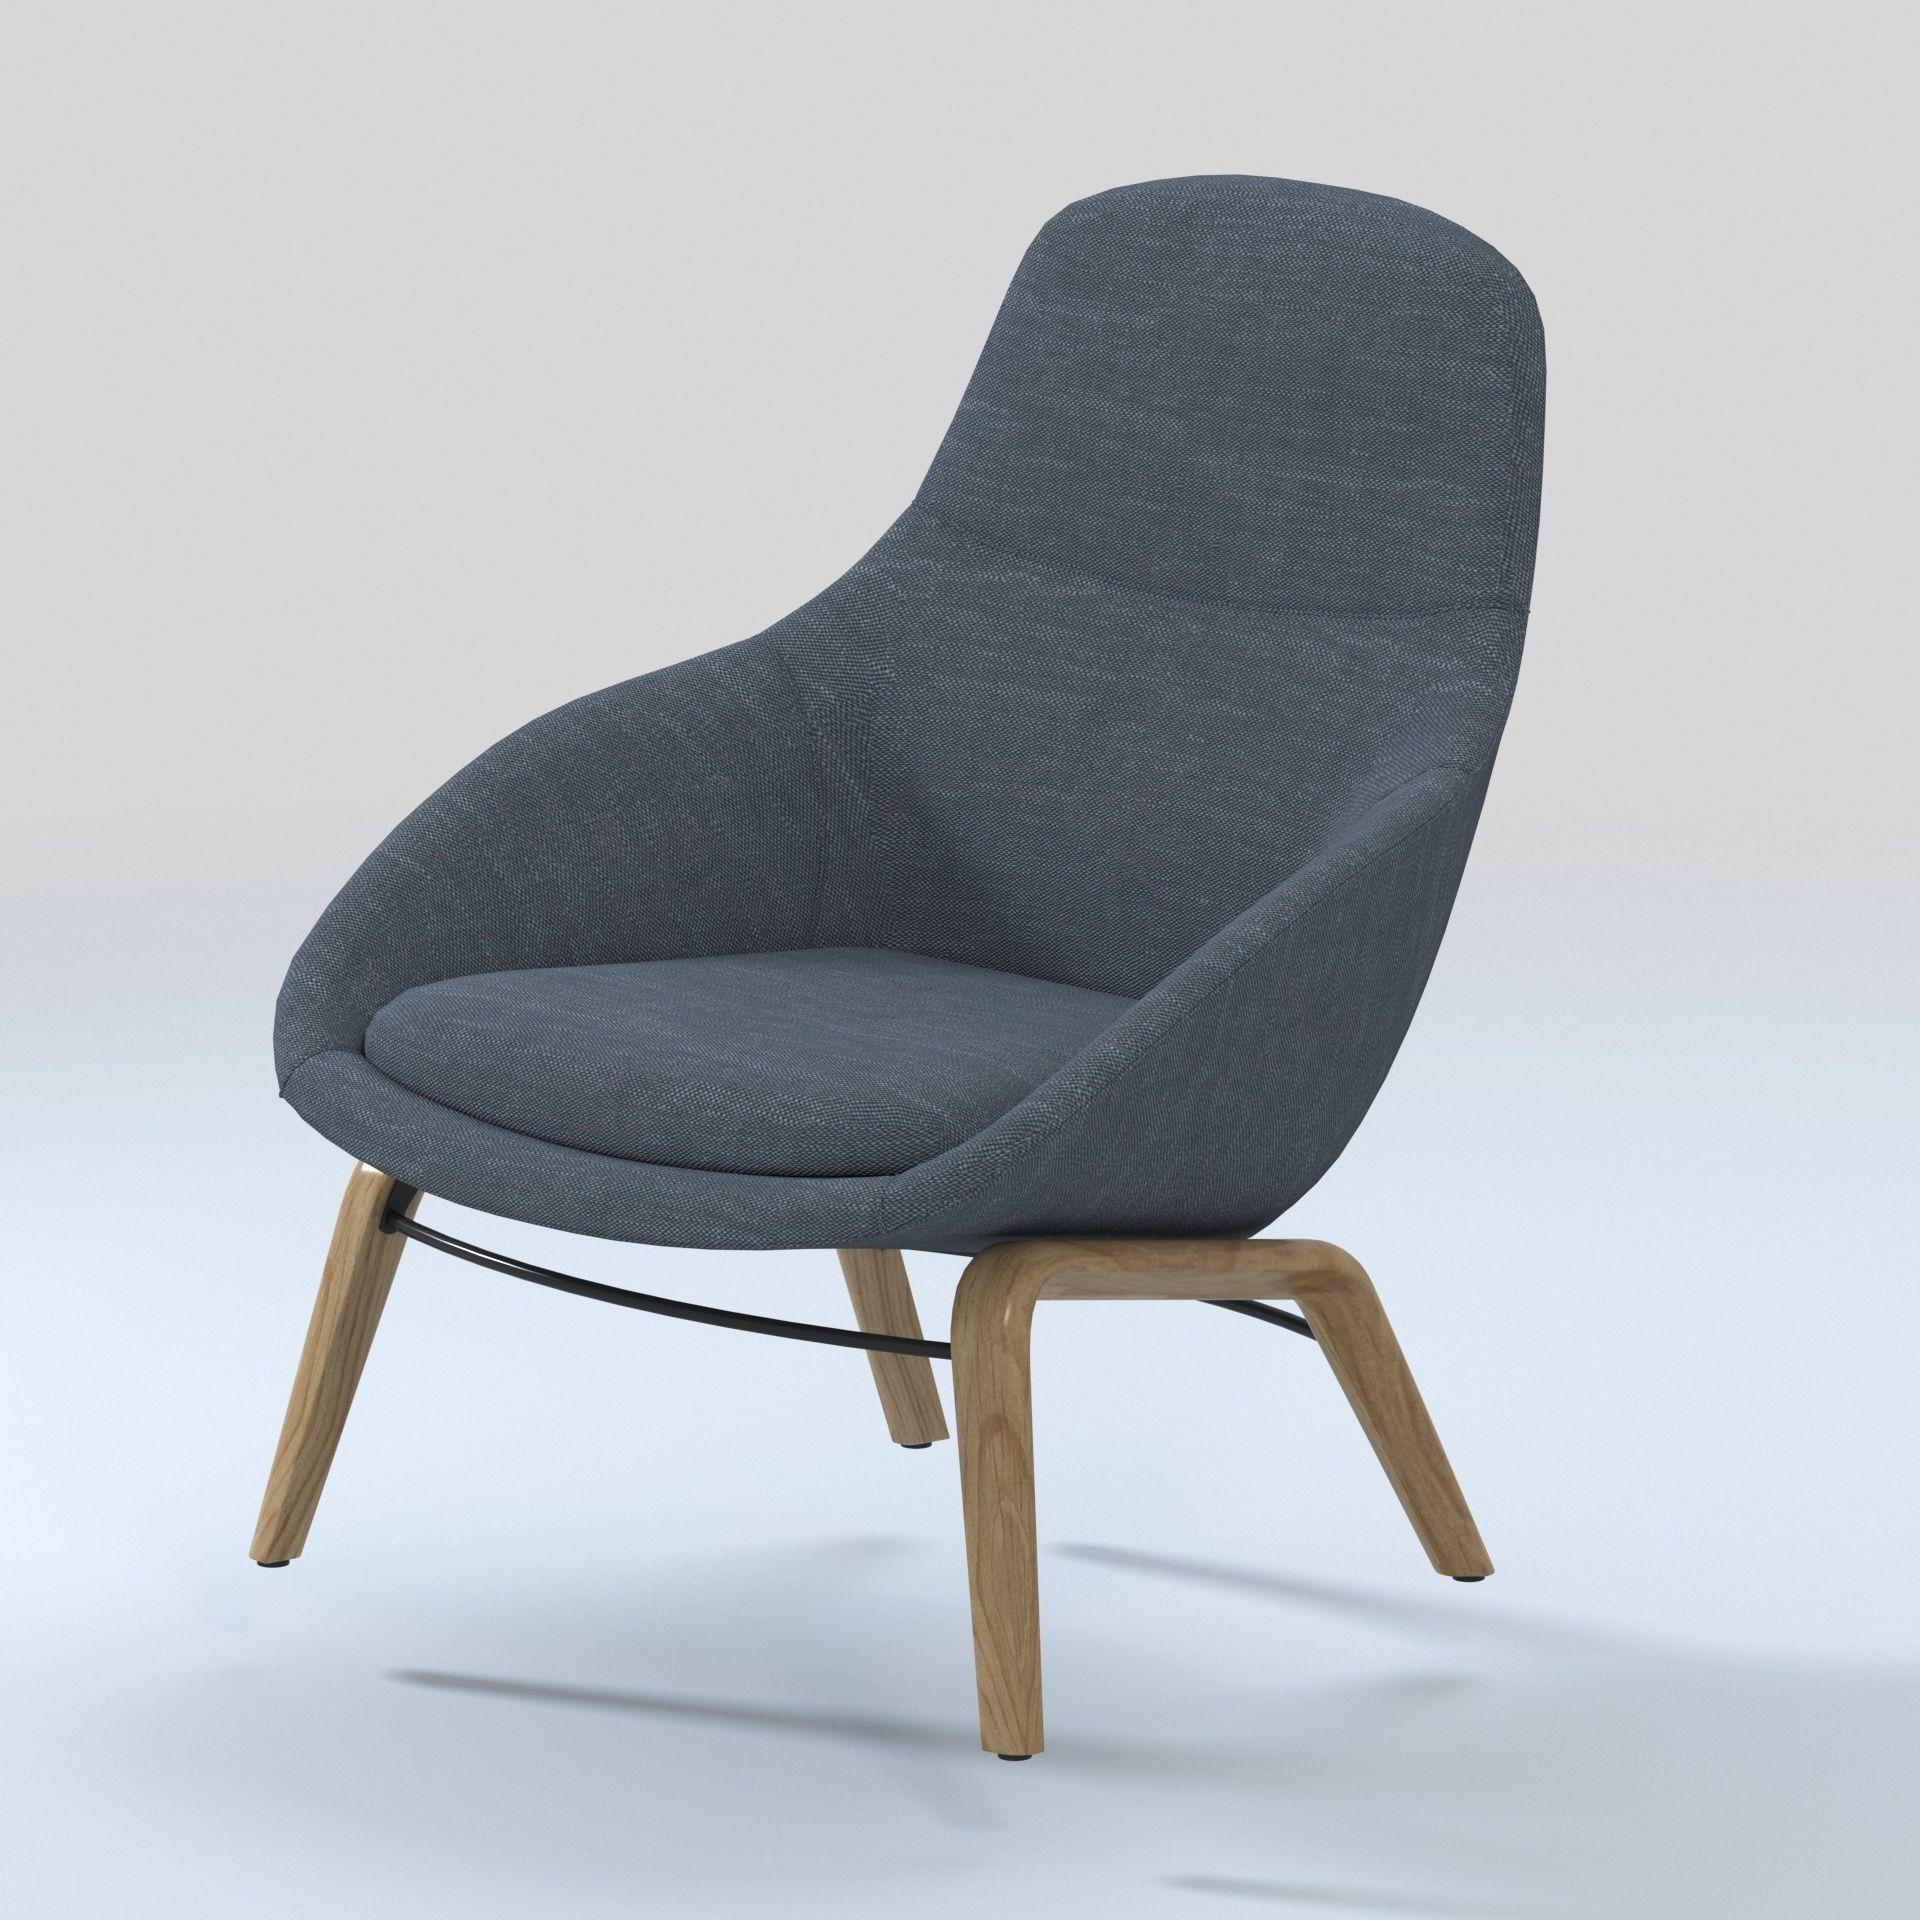 Naughtone - Always Lounge Chair